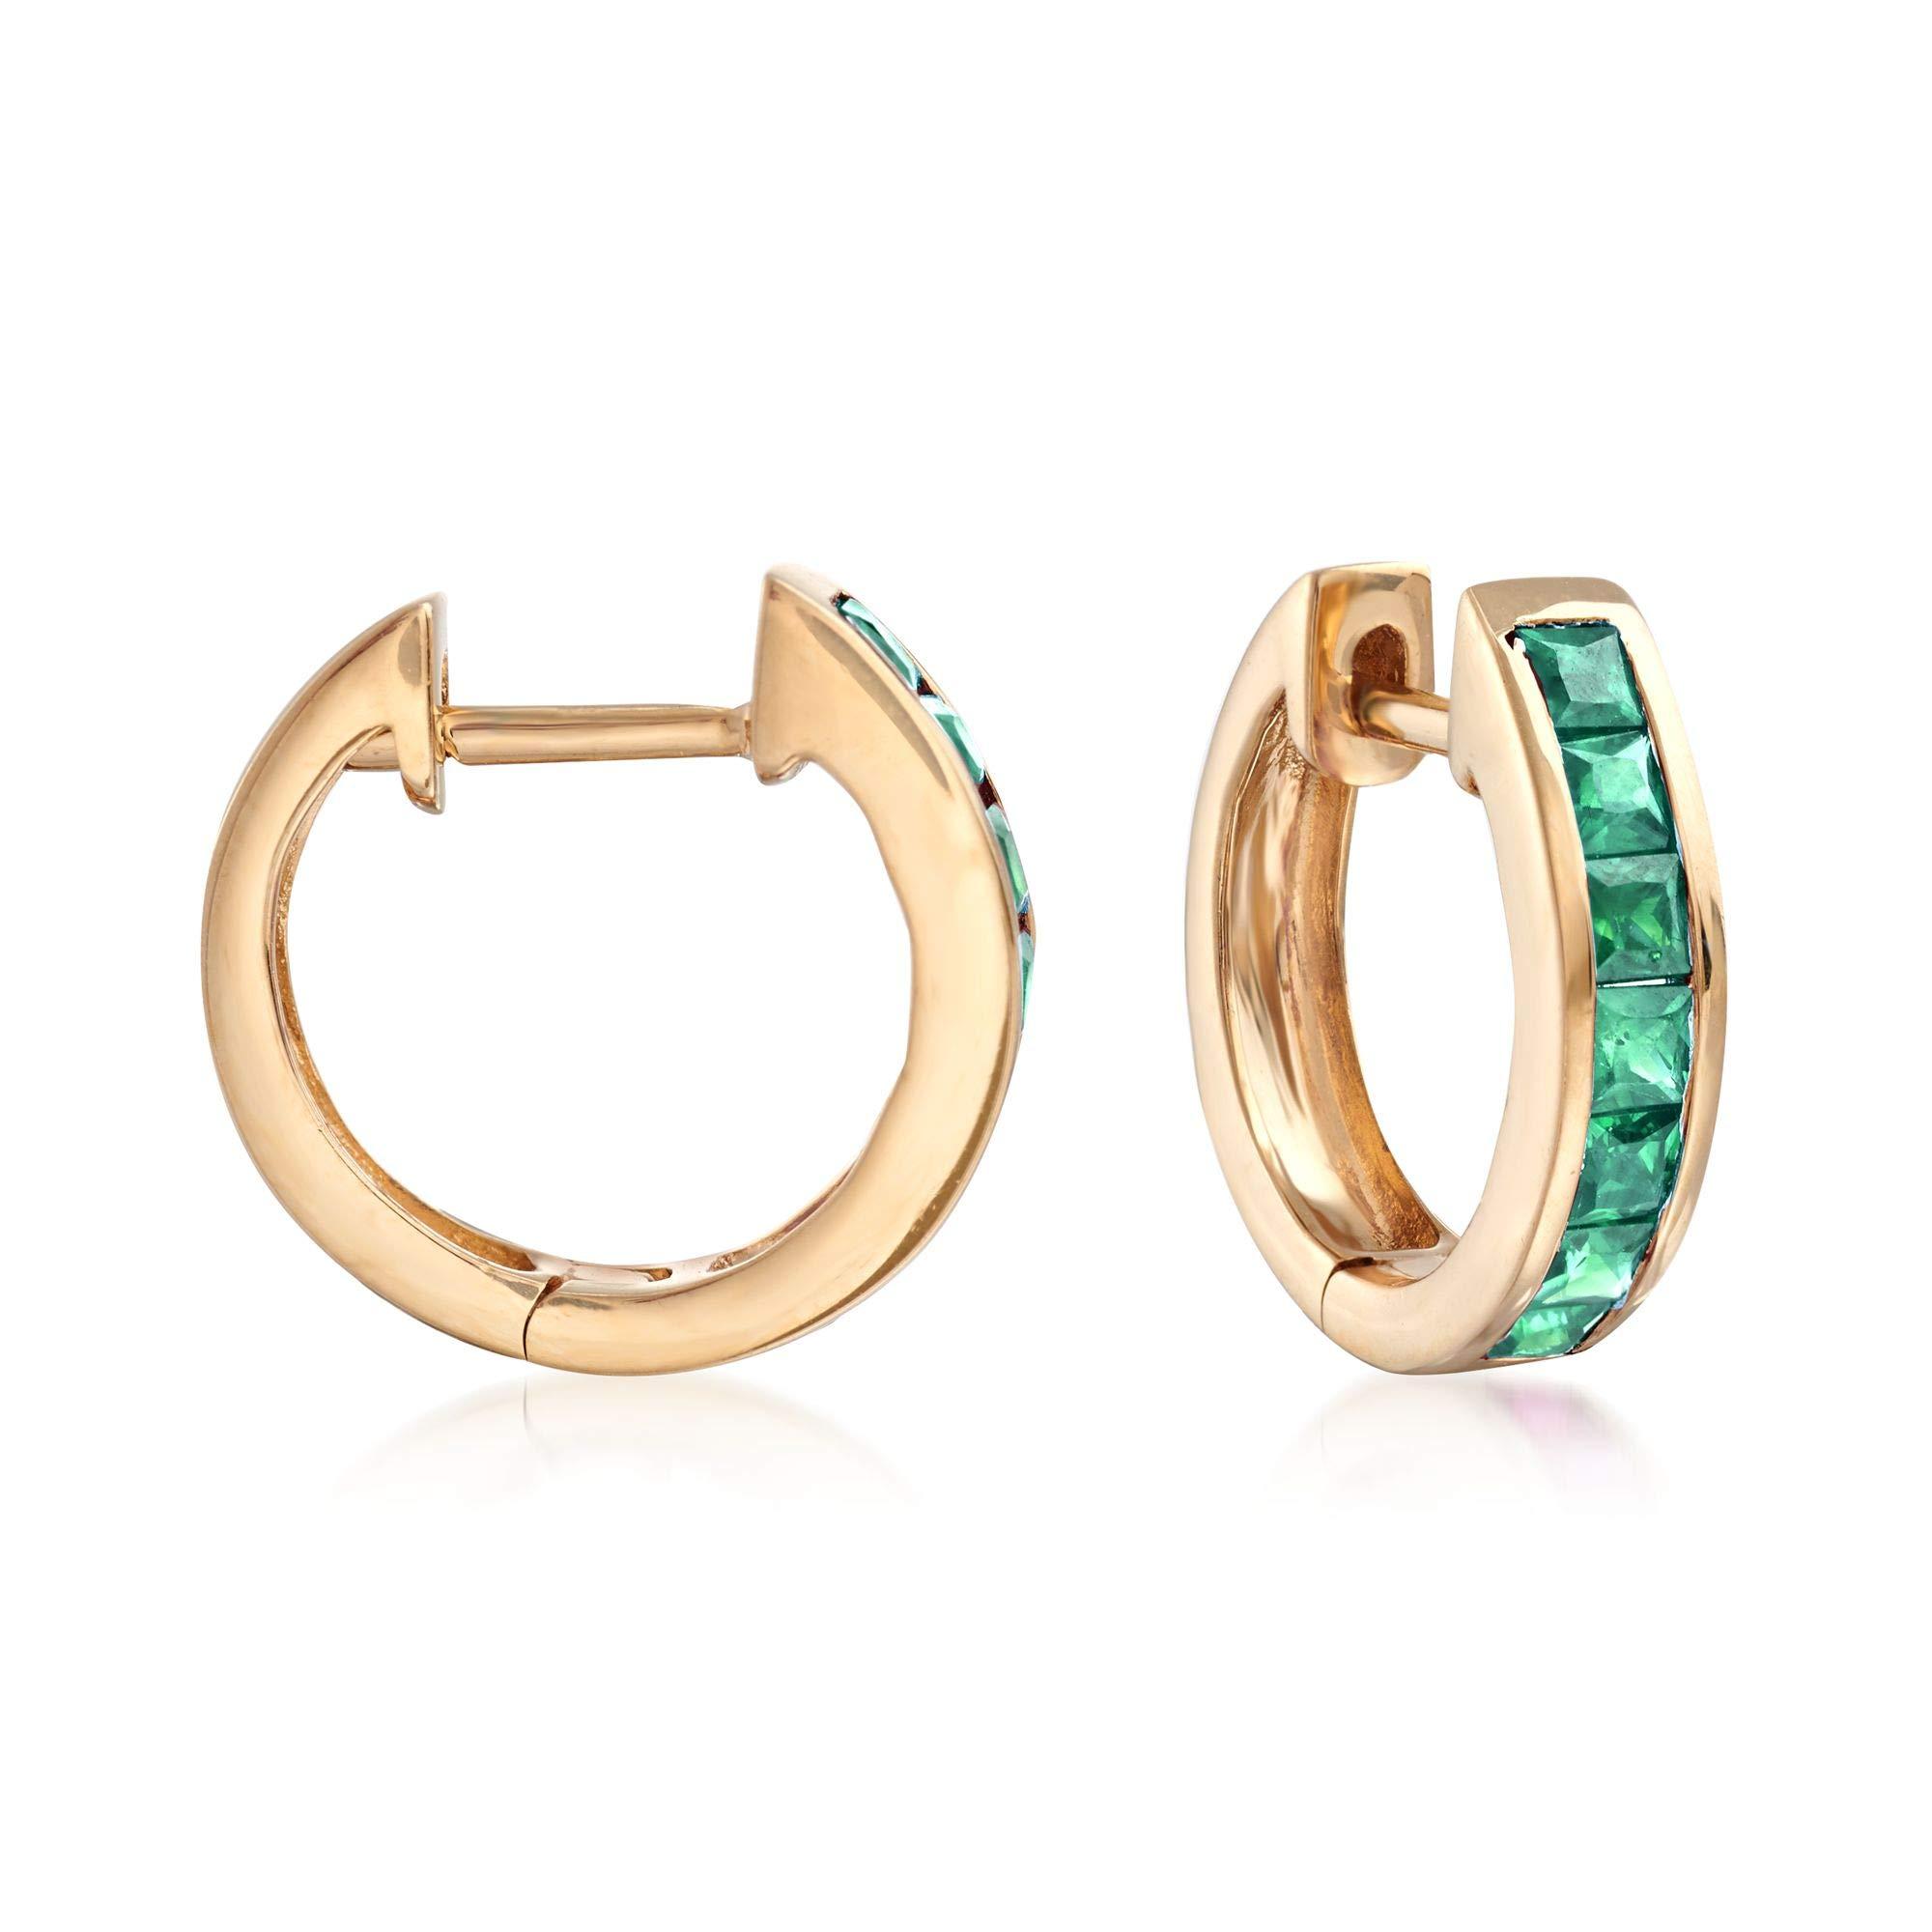 Ross-Simons 0.60 ct. t.w. Square-Cut Emerald Huggie Hoop Earrings in 14kt Yellow Gold